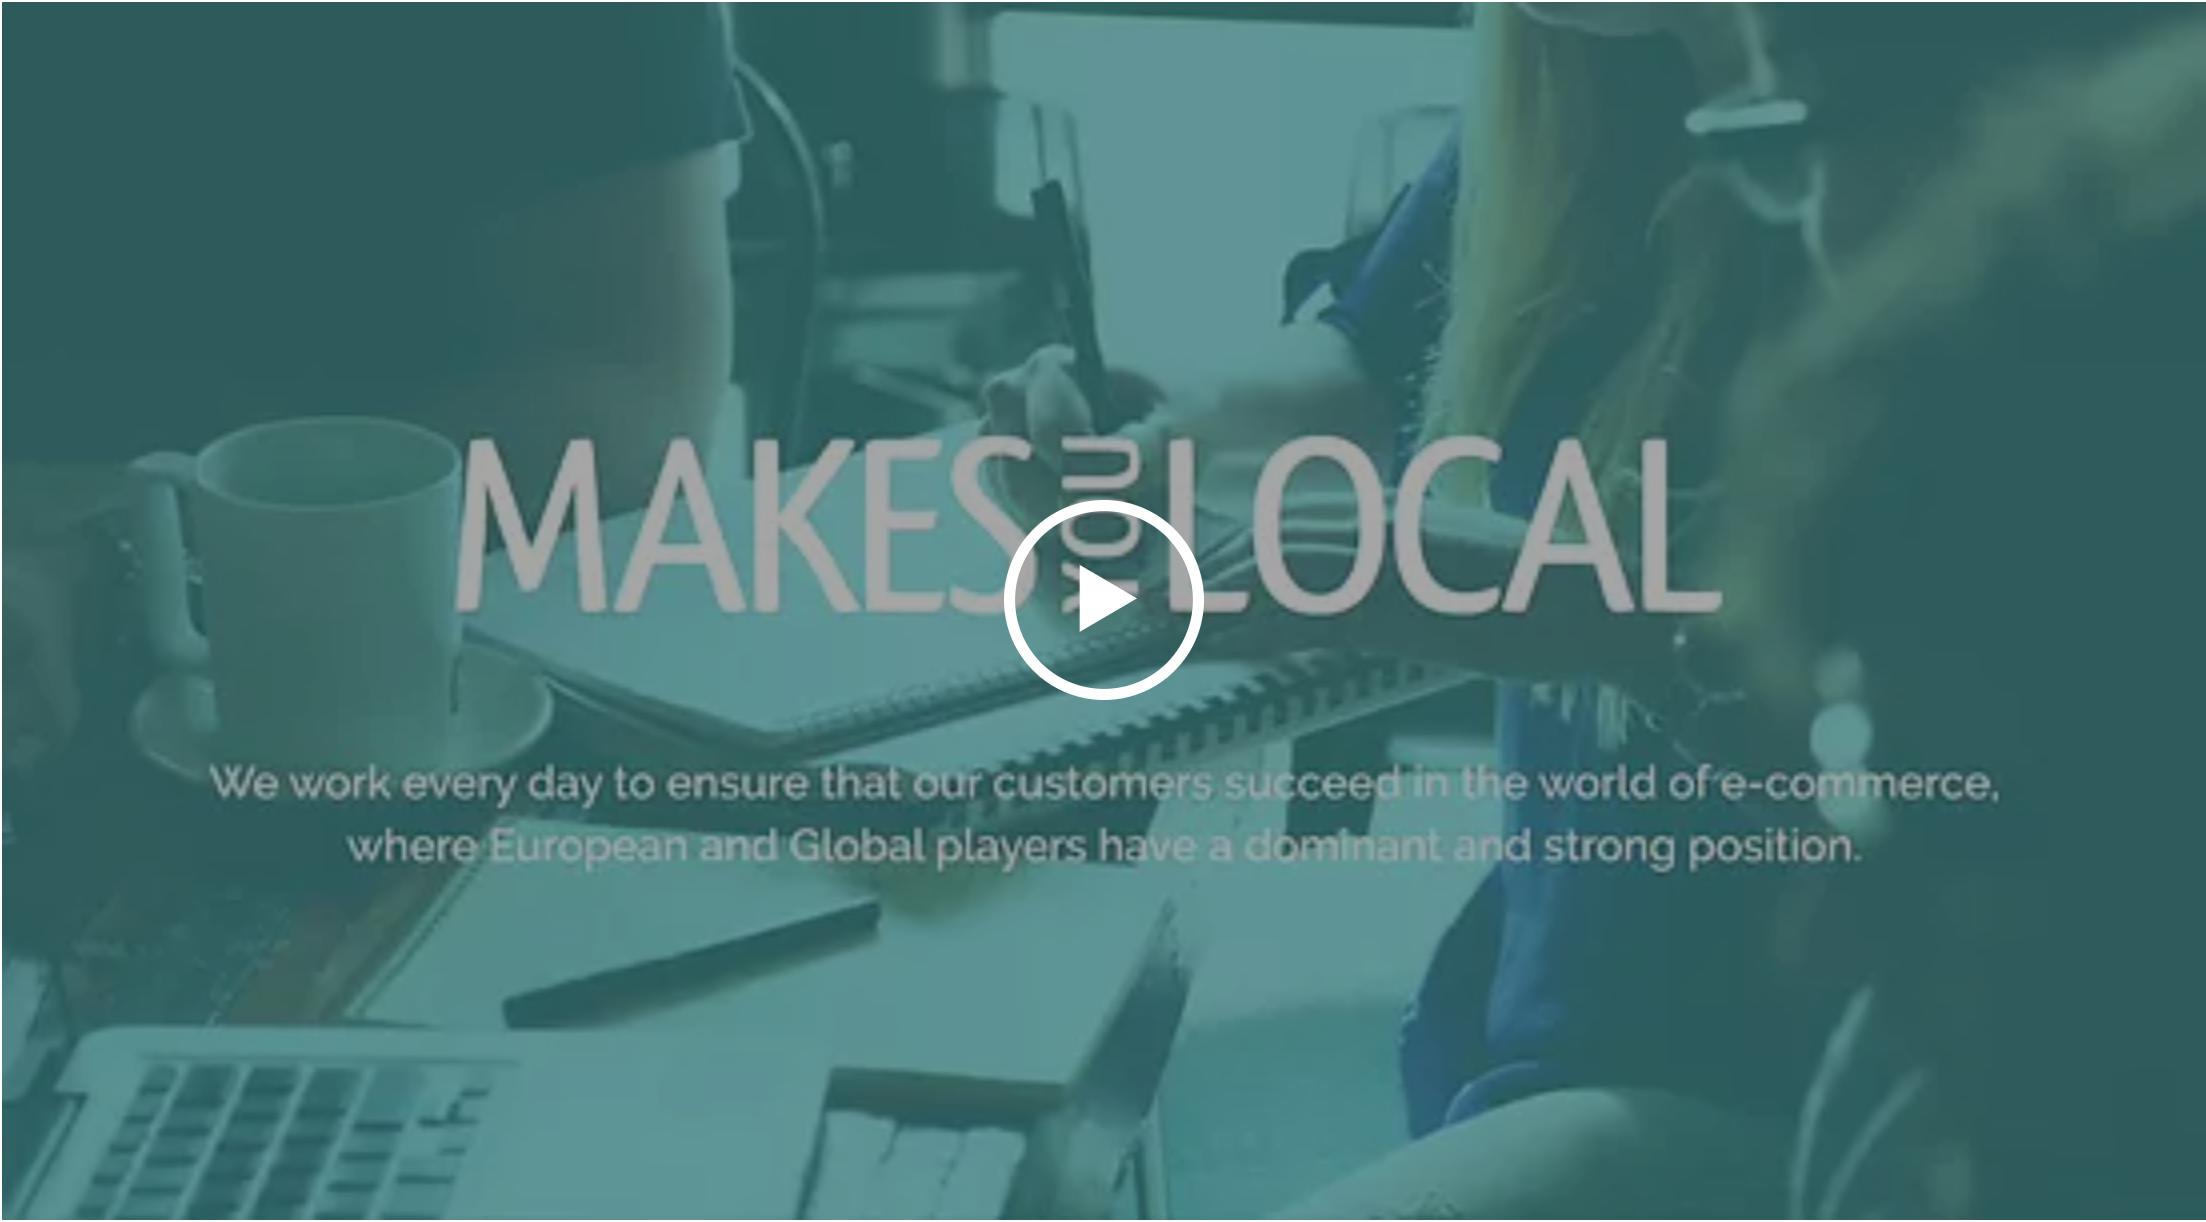 Makes you local - webinar med Starweb om internationellt e-handel